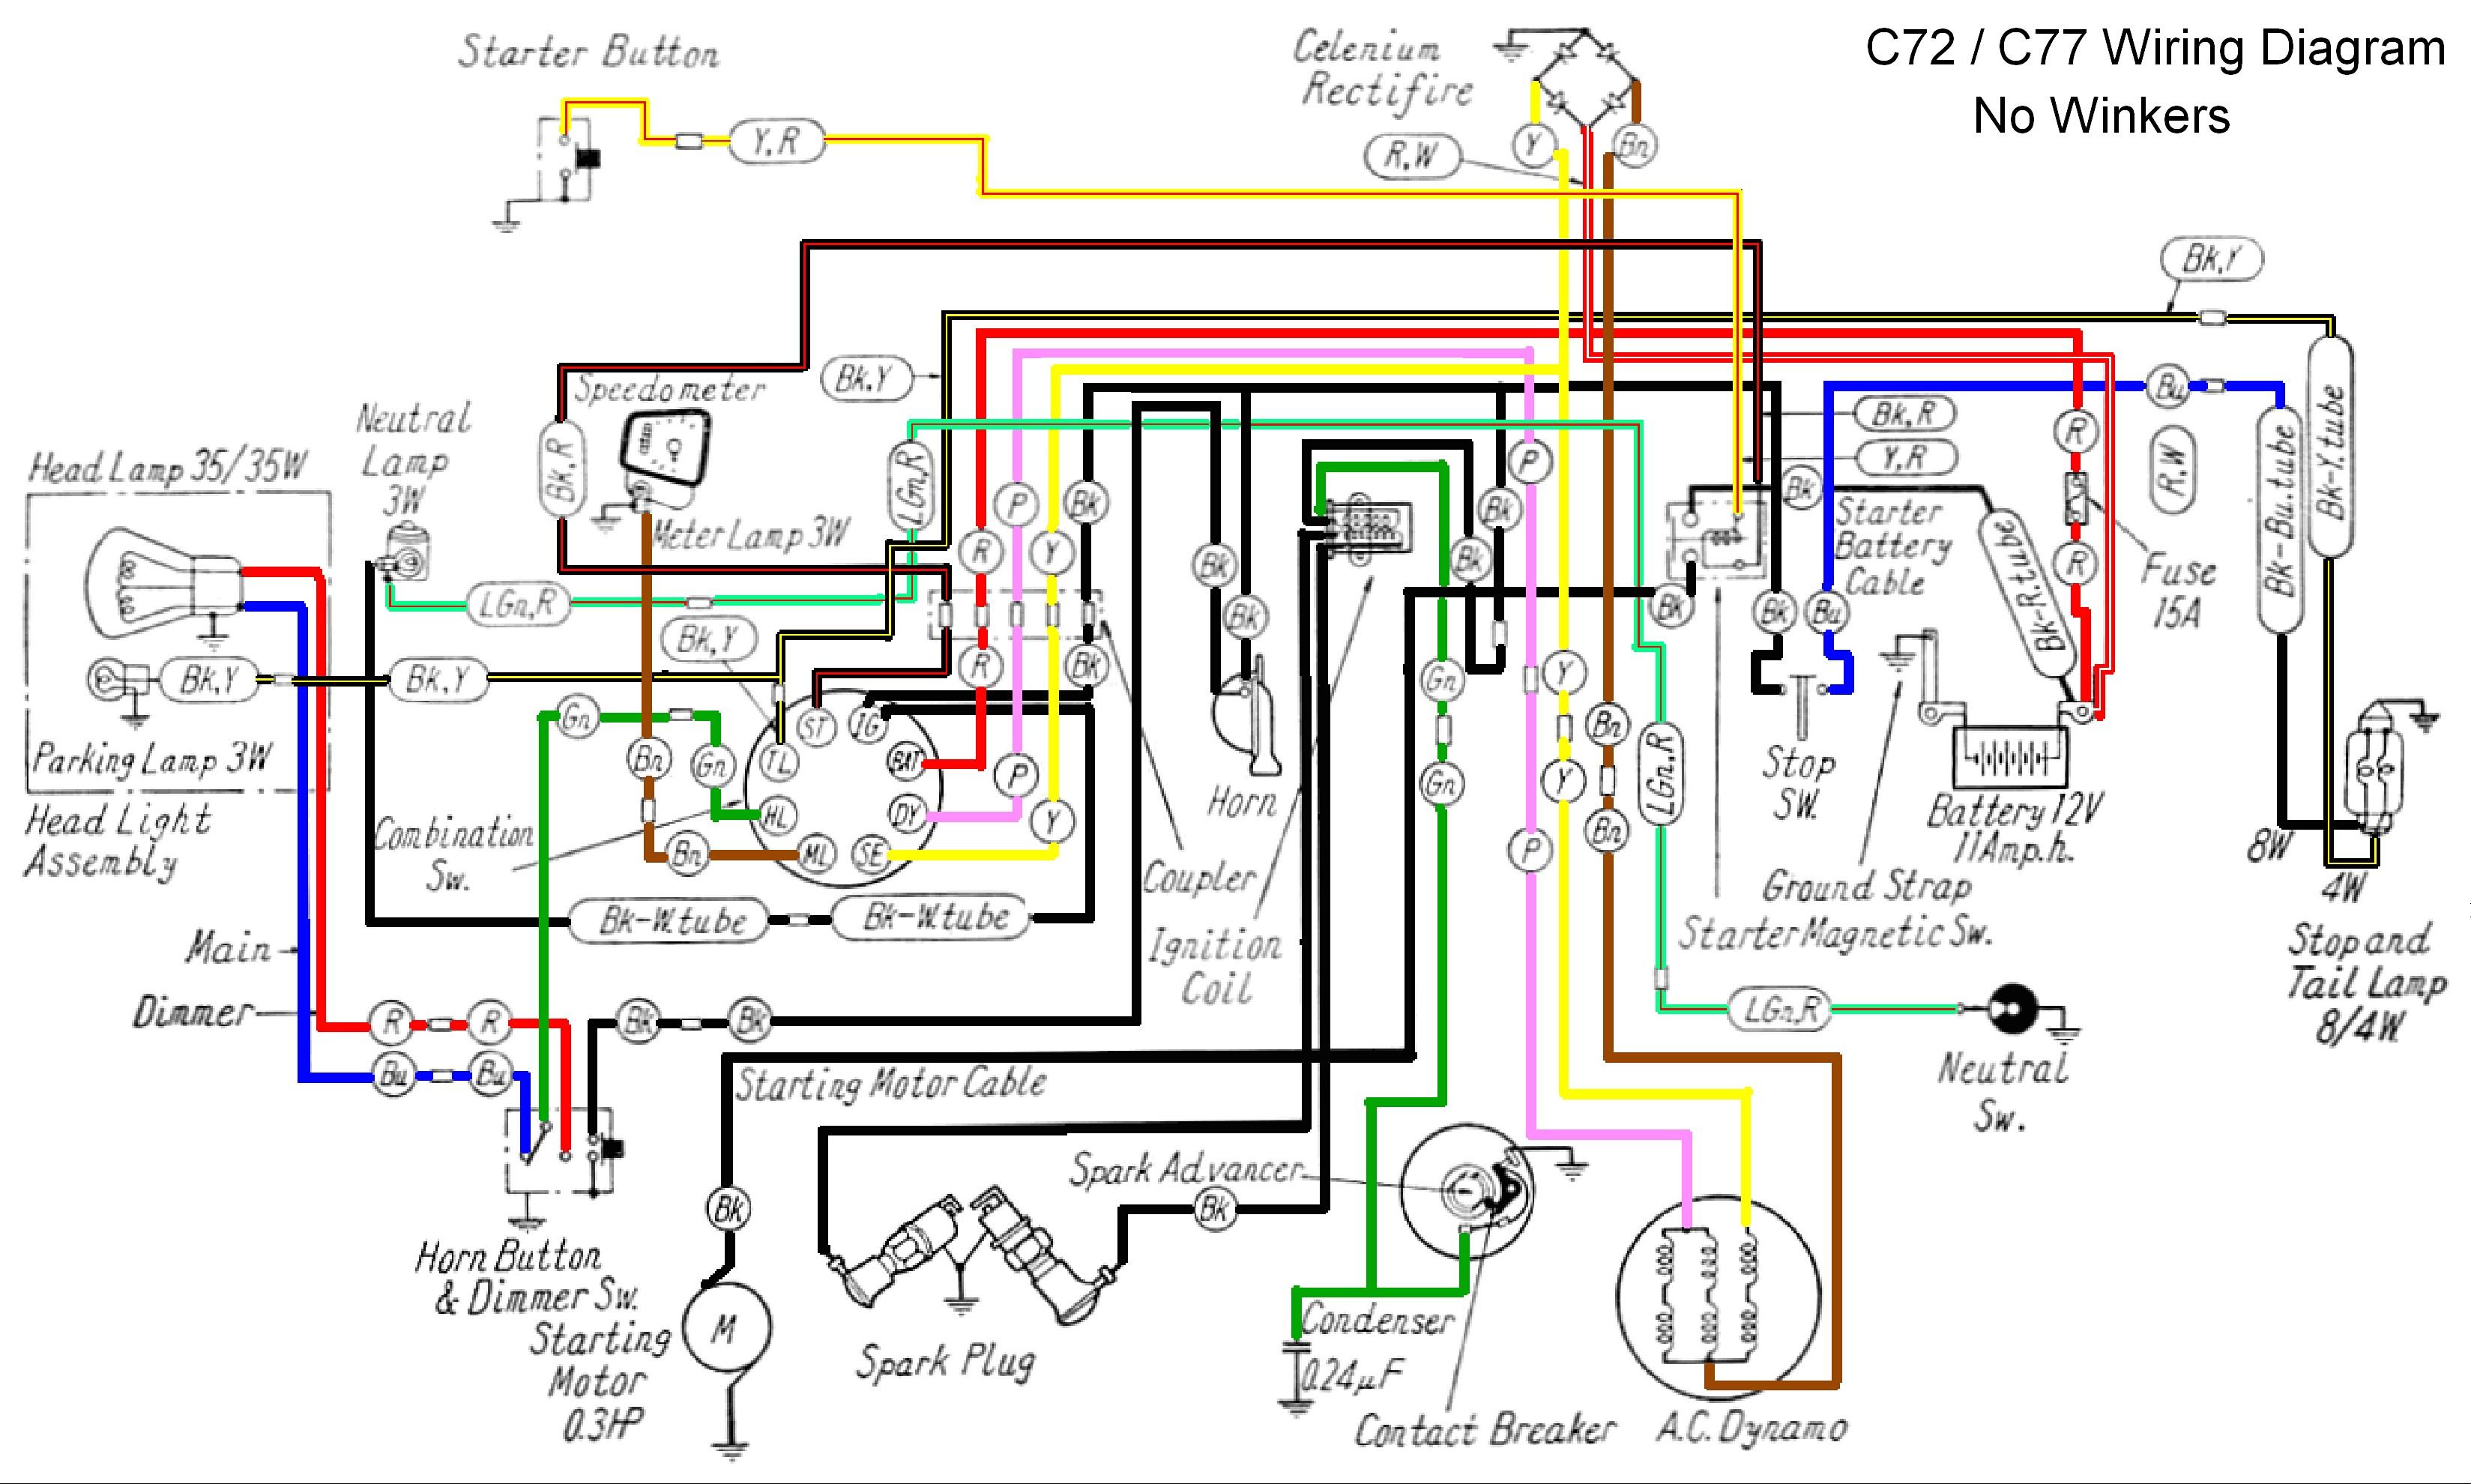 chris honda chopper wiring diagram - diagram data schema on norton wiring  diagram, vengeance wiring diagram